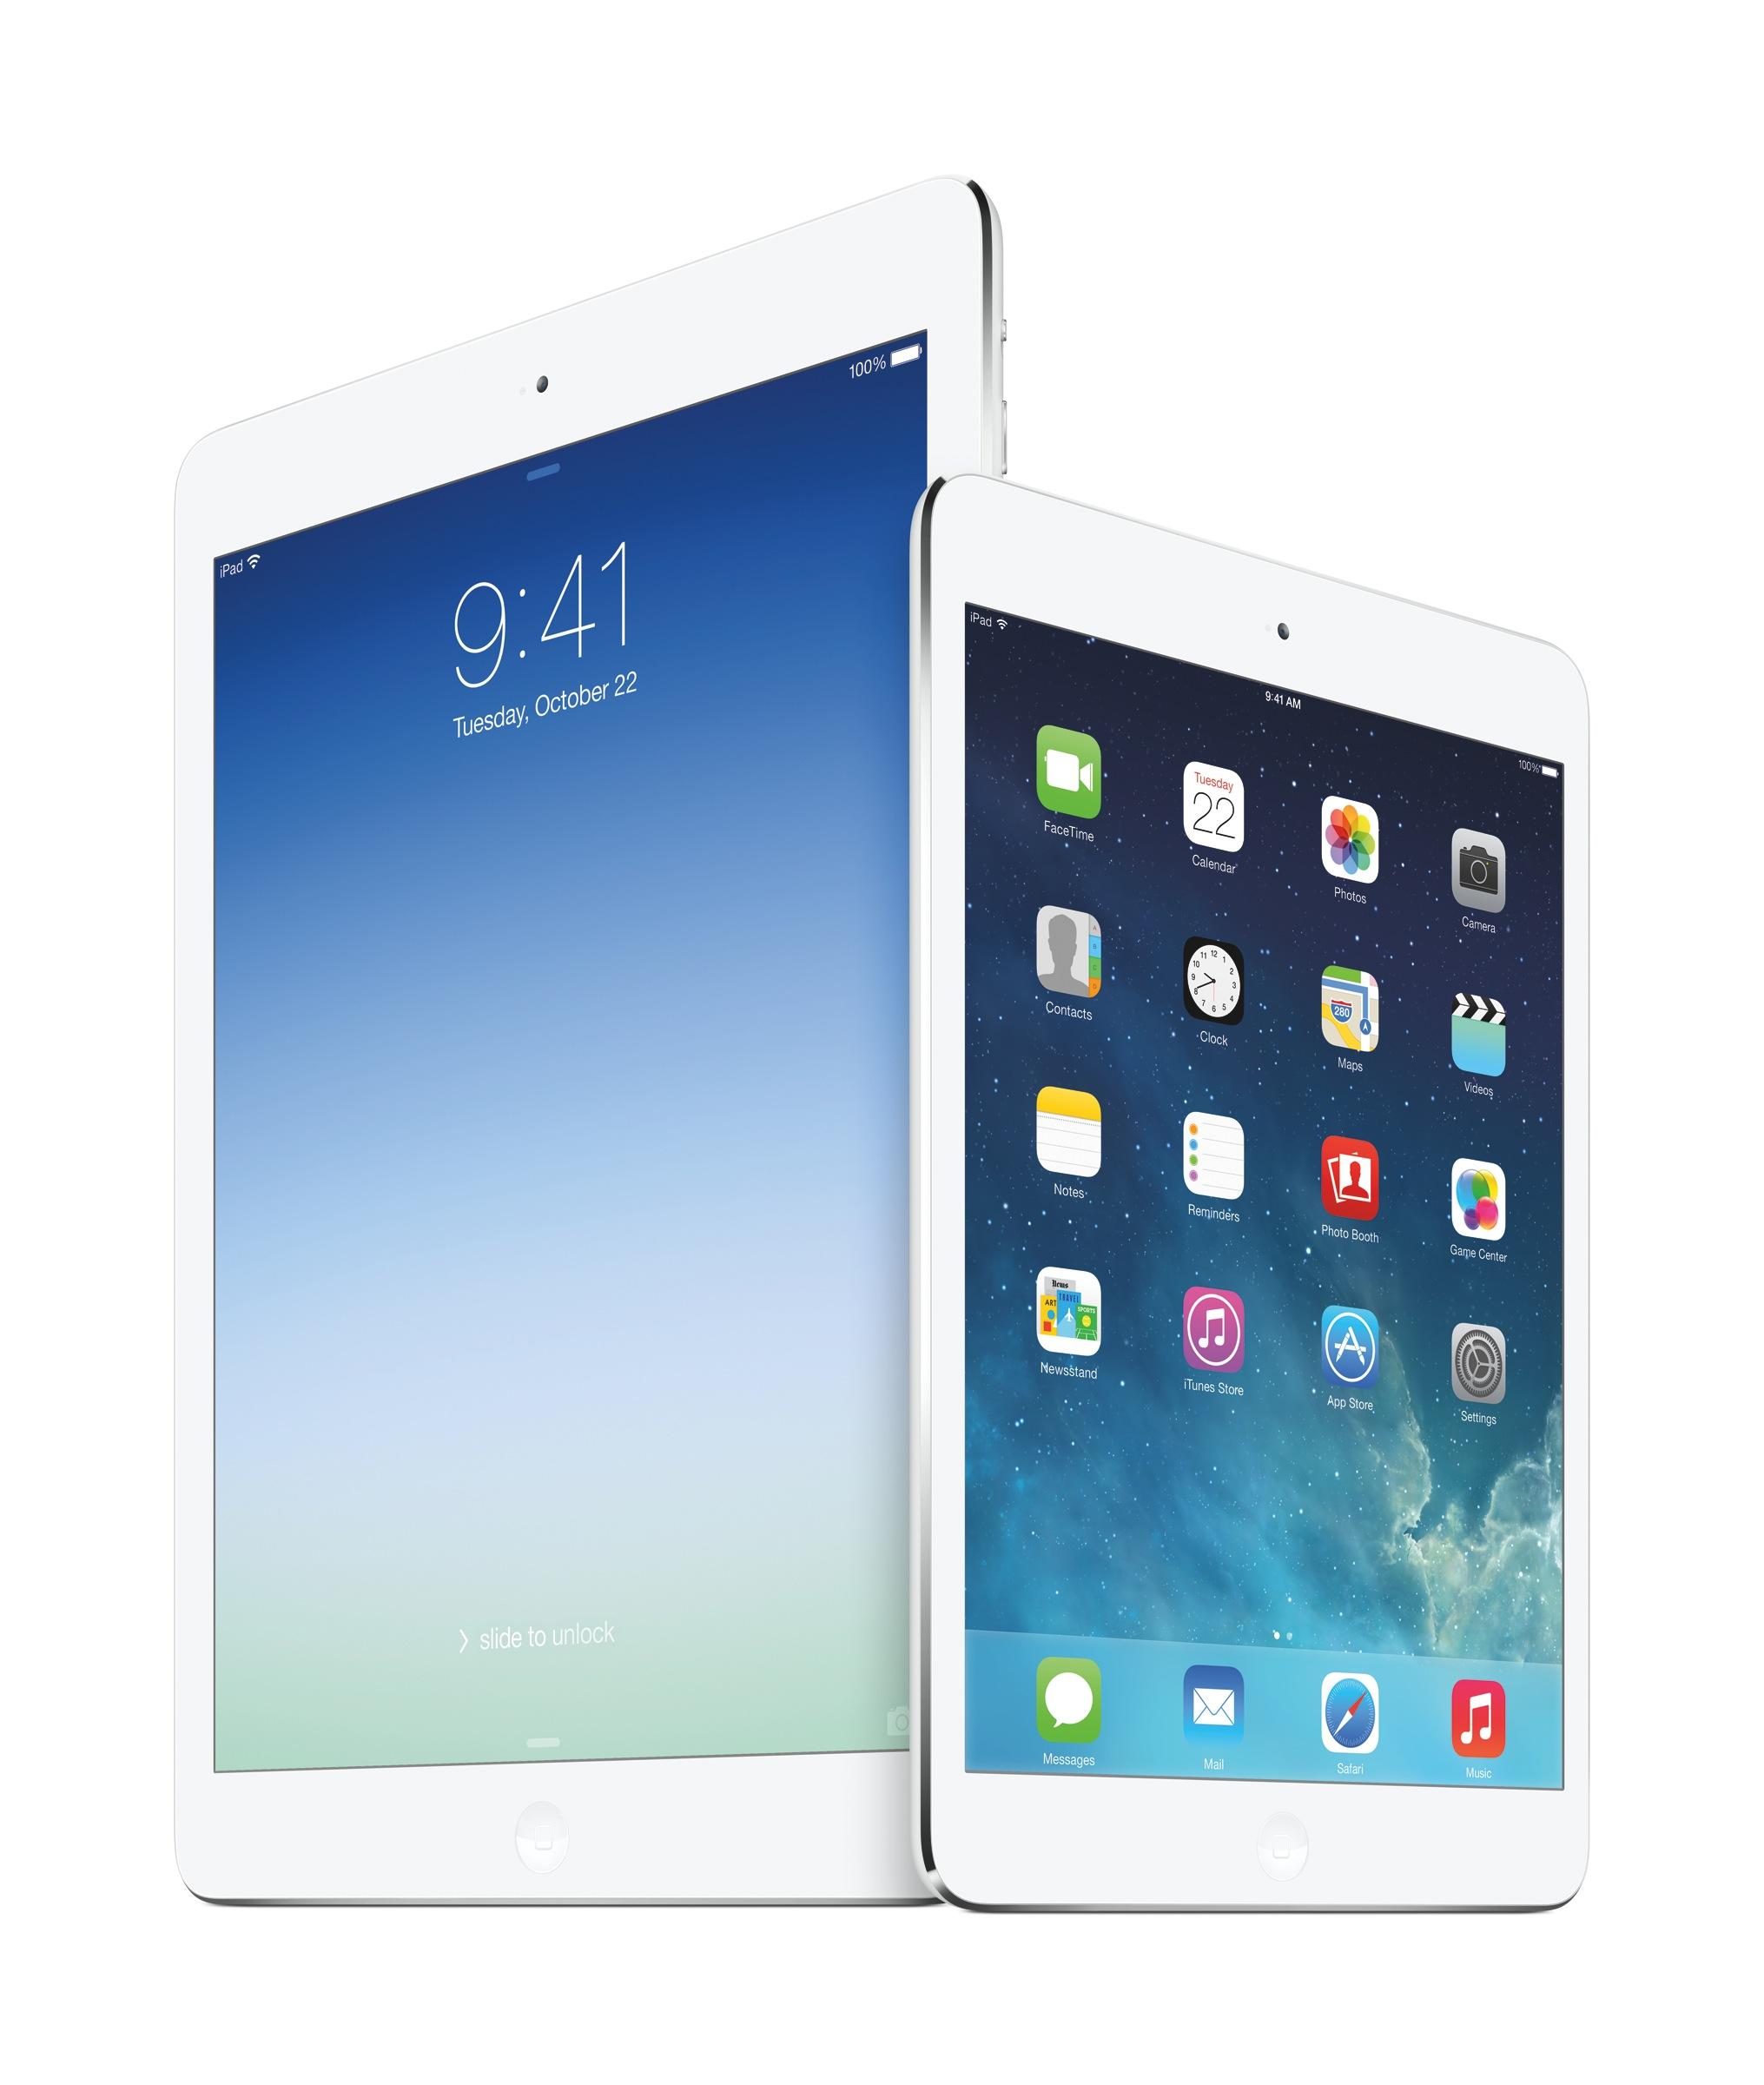 Apple Unveils New iPad Air and iPad Mini with Retina Display